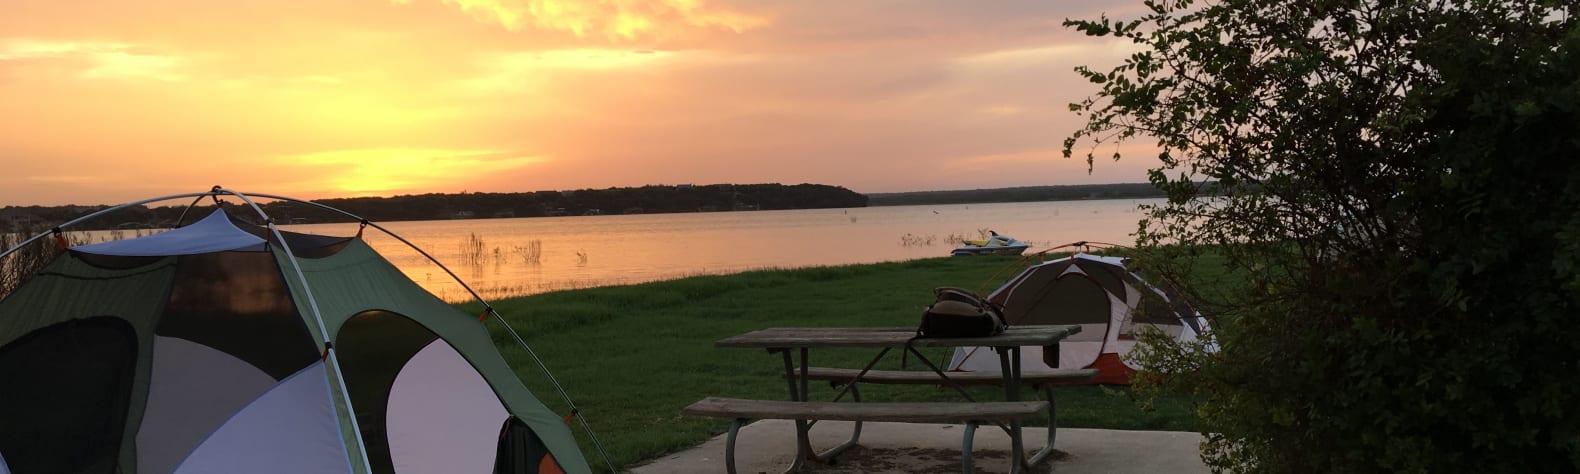 Lake Brownwood State Park